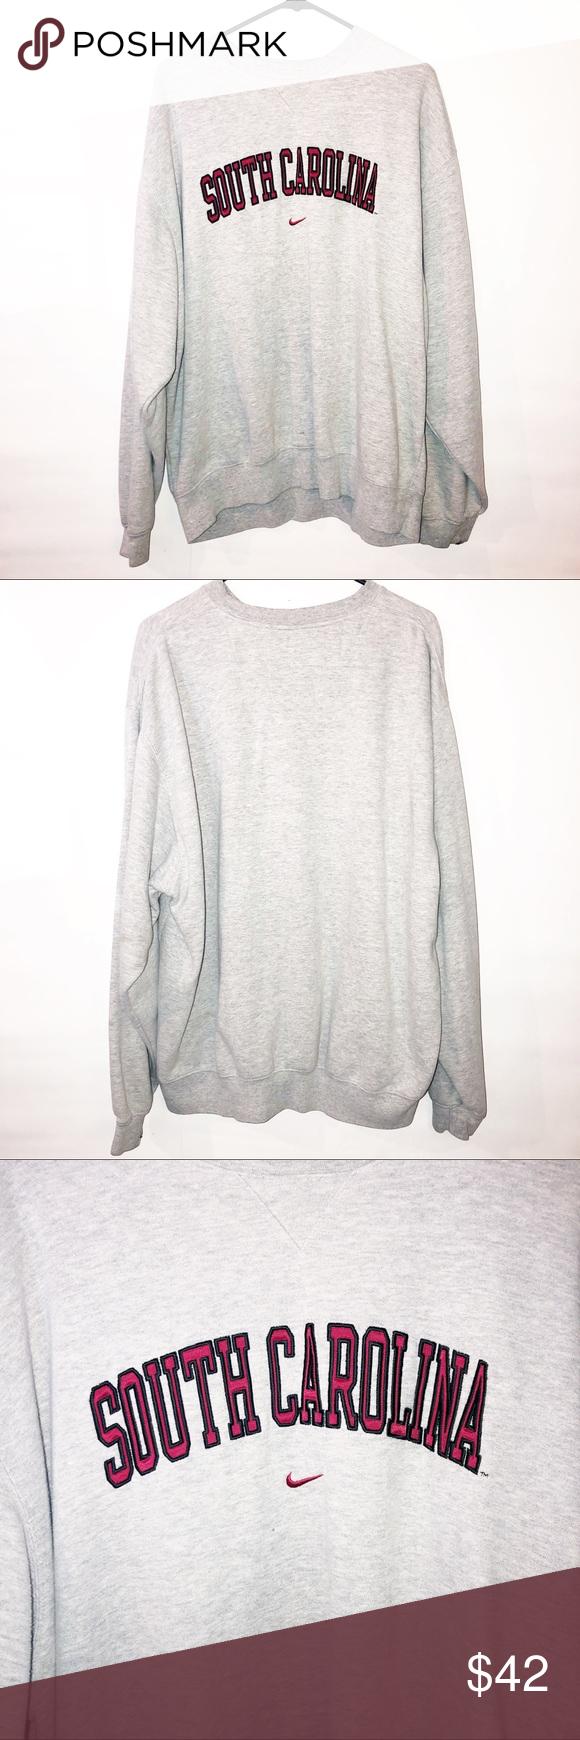 Nike Grey Red Sc Crewneck Sweatshirt Crew Neck Sweatshirt Sweatshirts Vintage Sweatshirt [ 1740 x 580 Pixel ]